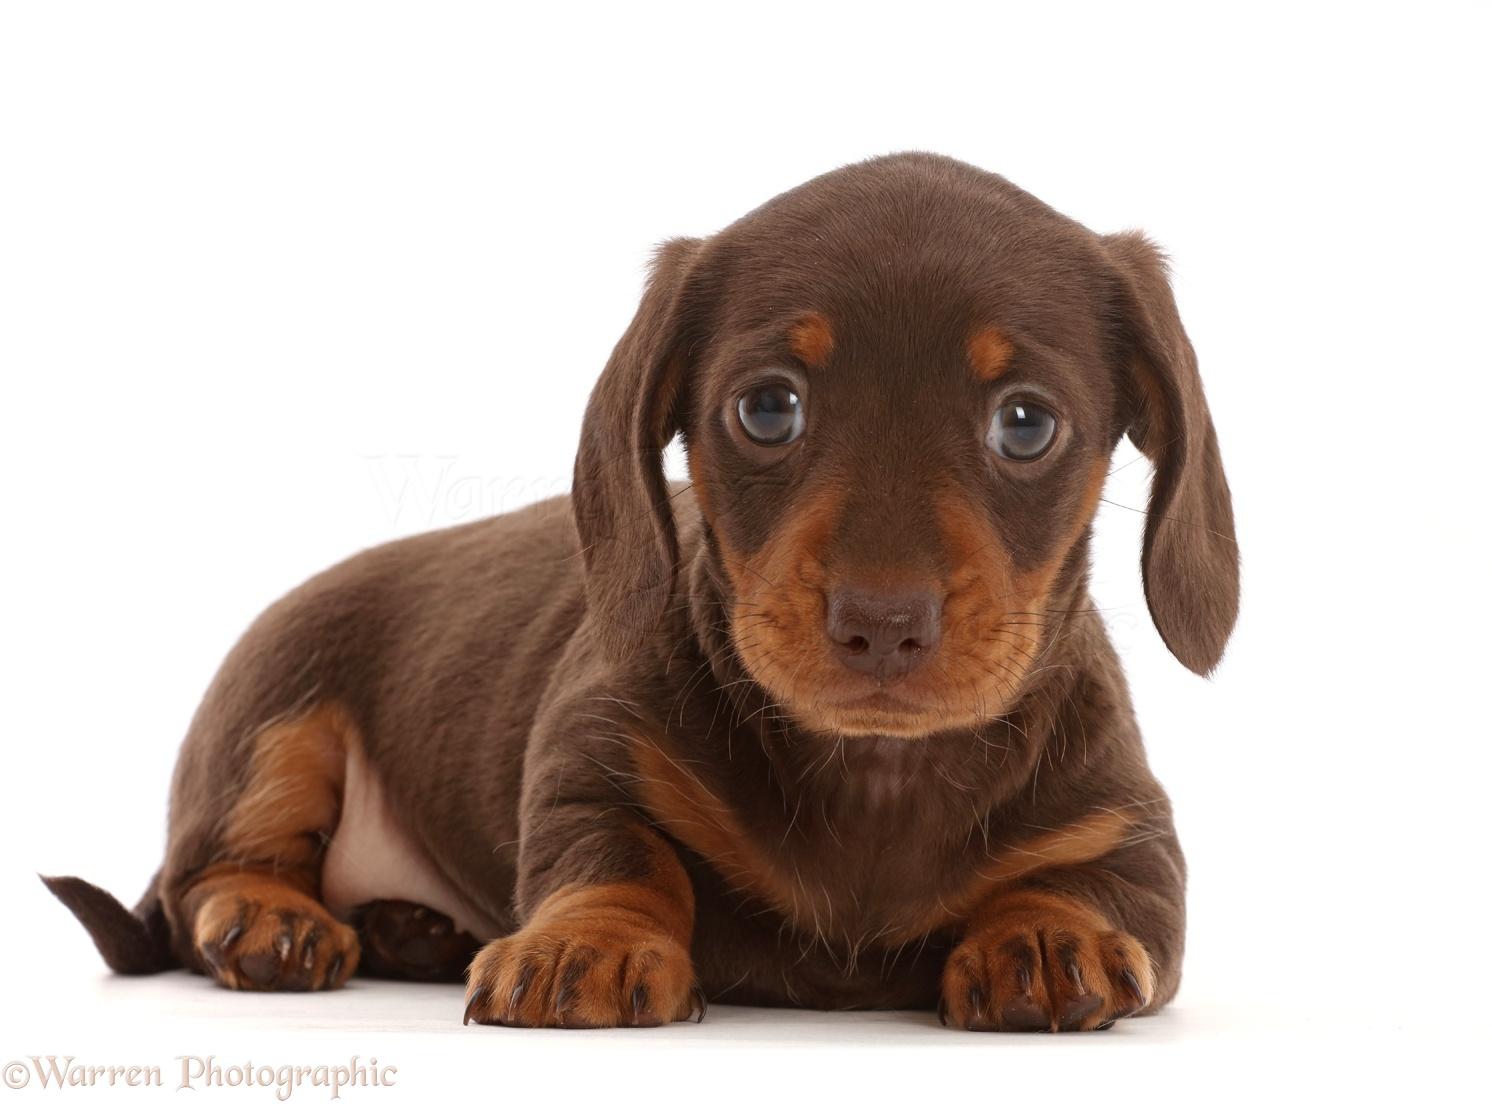 Dog Chocolate Dachshund Puppy Photo Wp46020